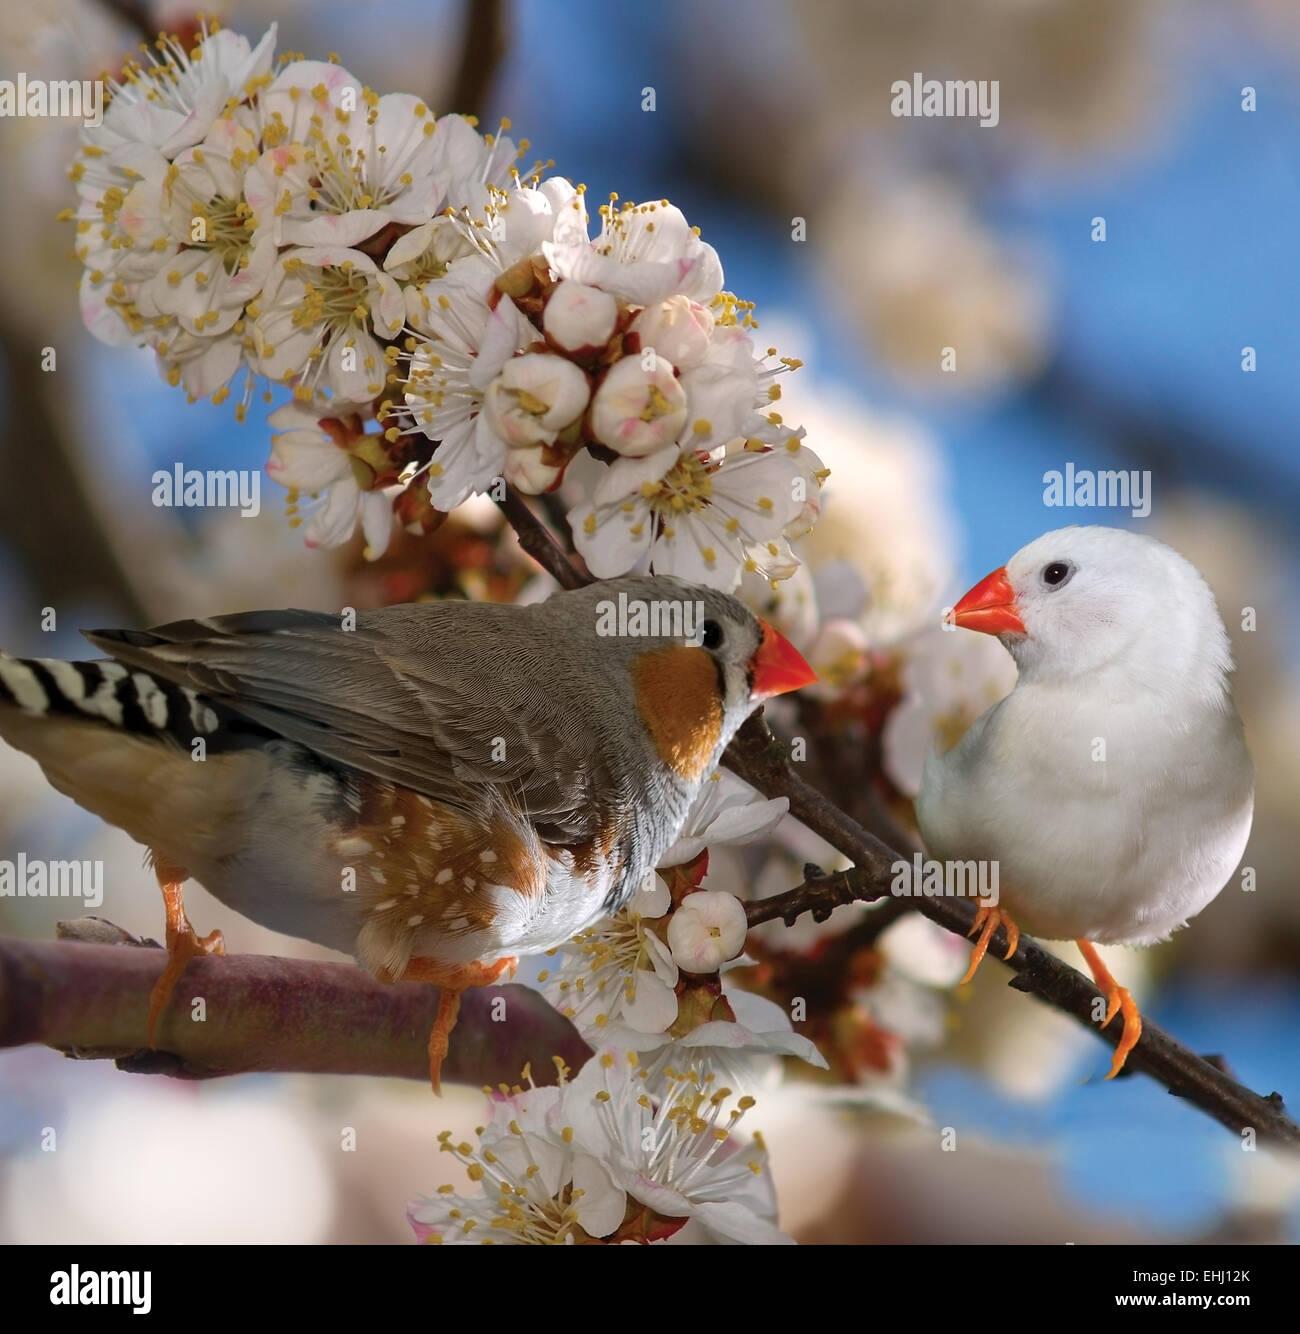 Birds finches(Taeniopugia guttata) on a blossoming branch of apricot(Armeniaca) square - Stock Image